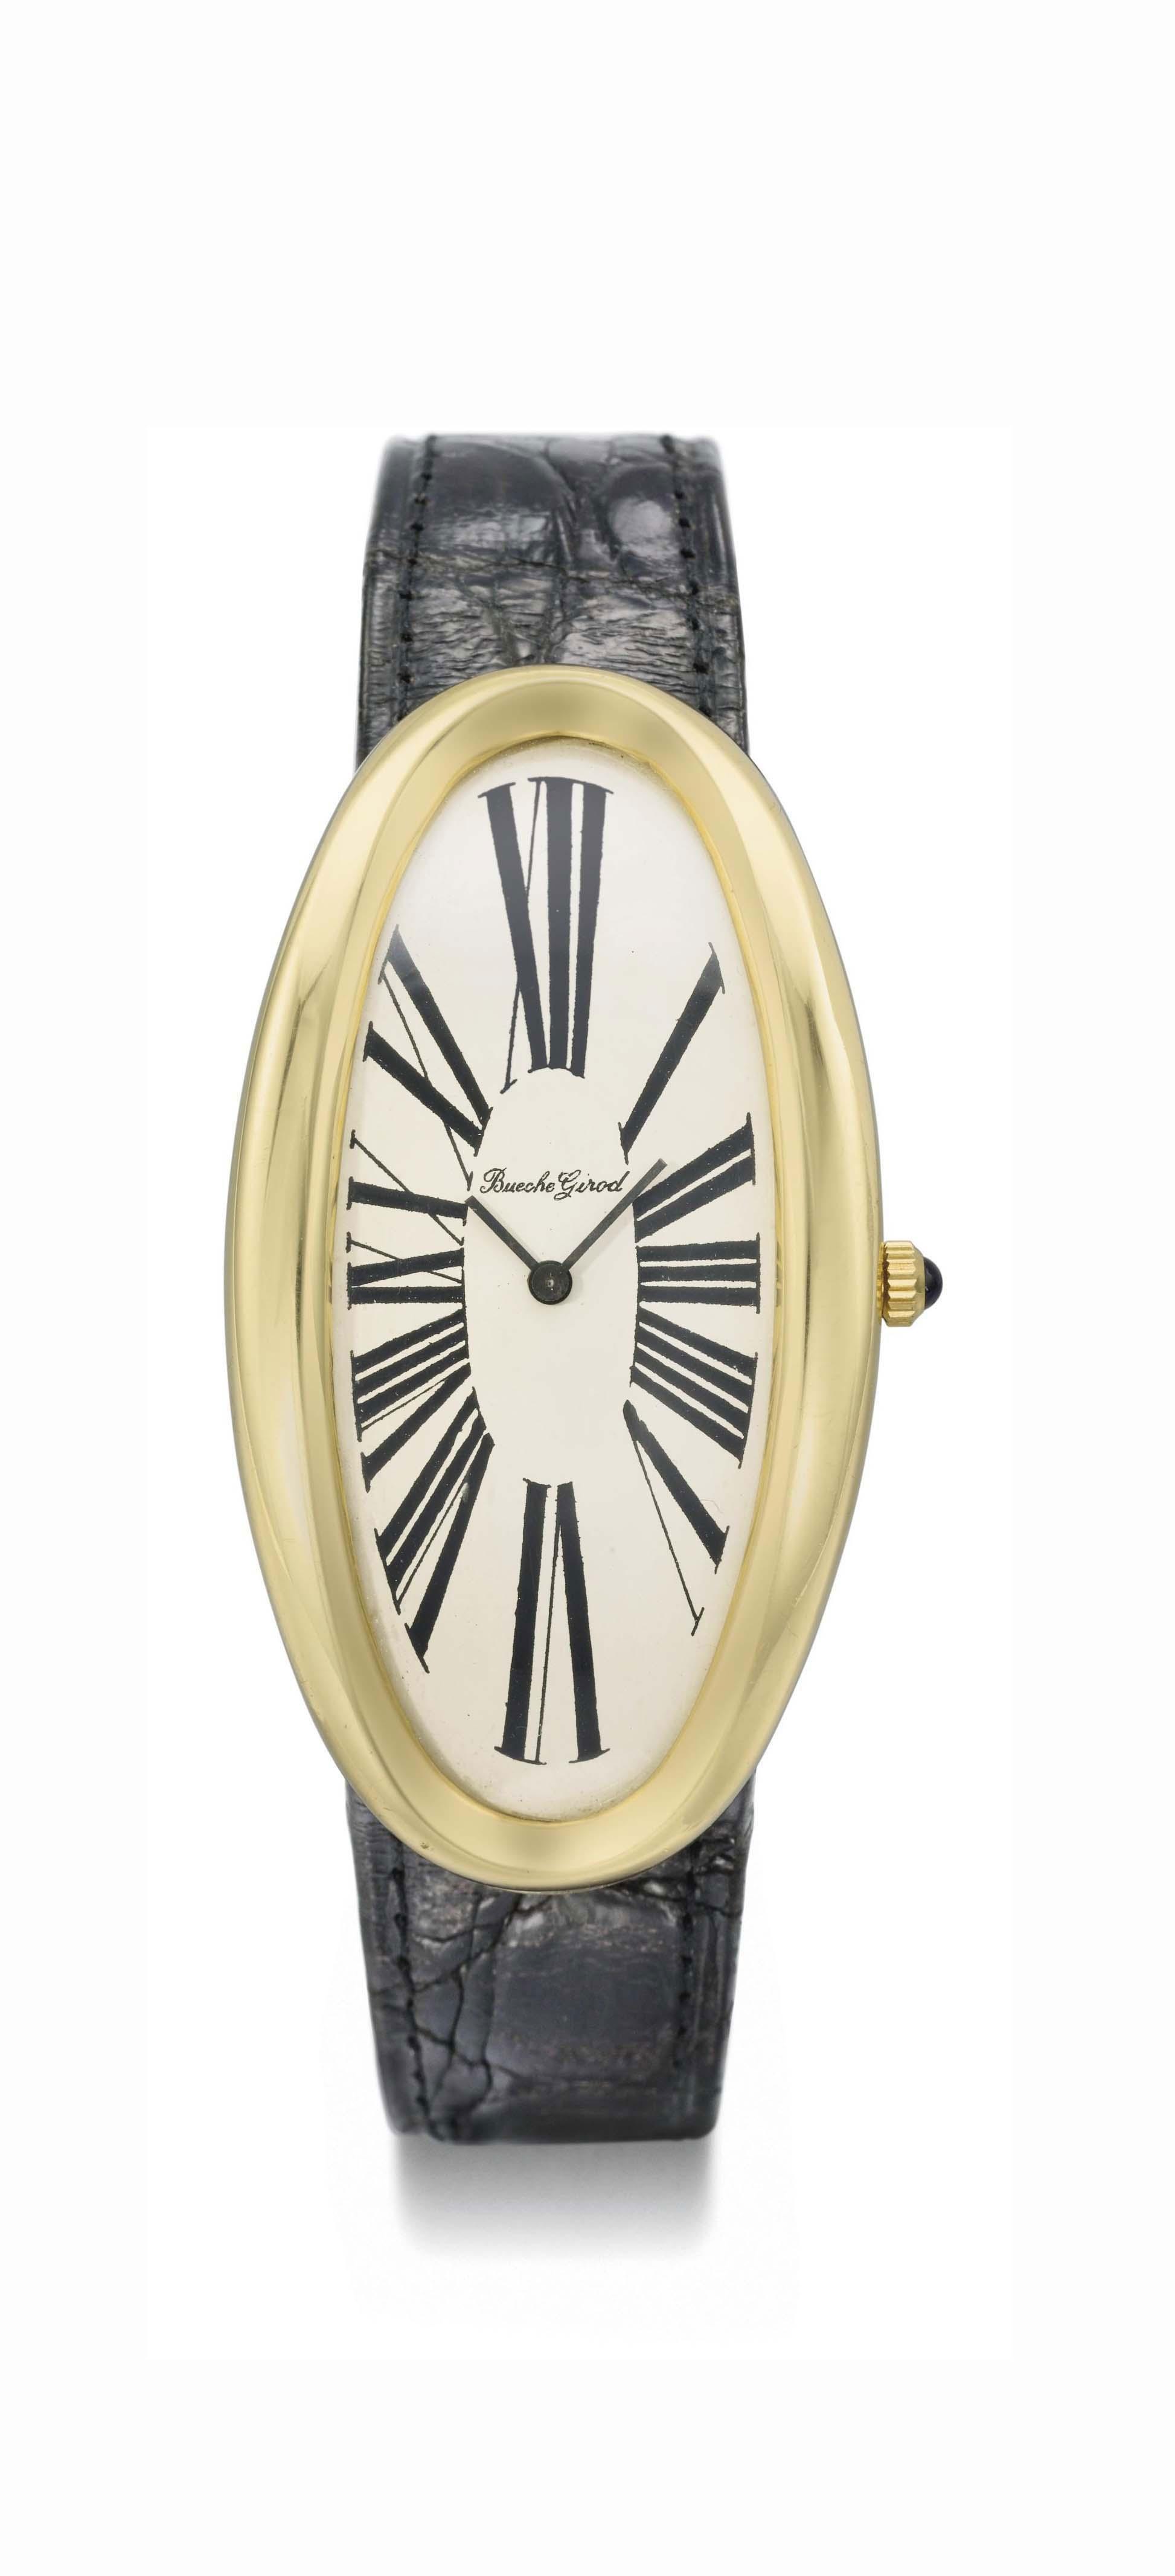 Bueche Girod. An unusual oversized 18K gold oval curved wristwatch